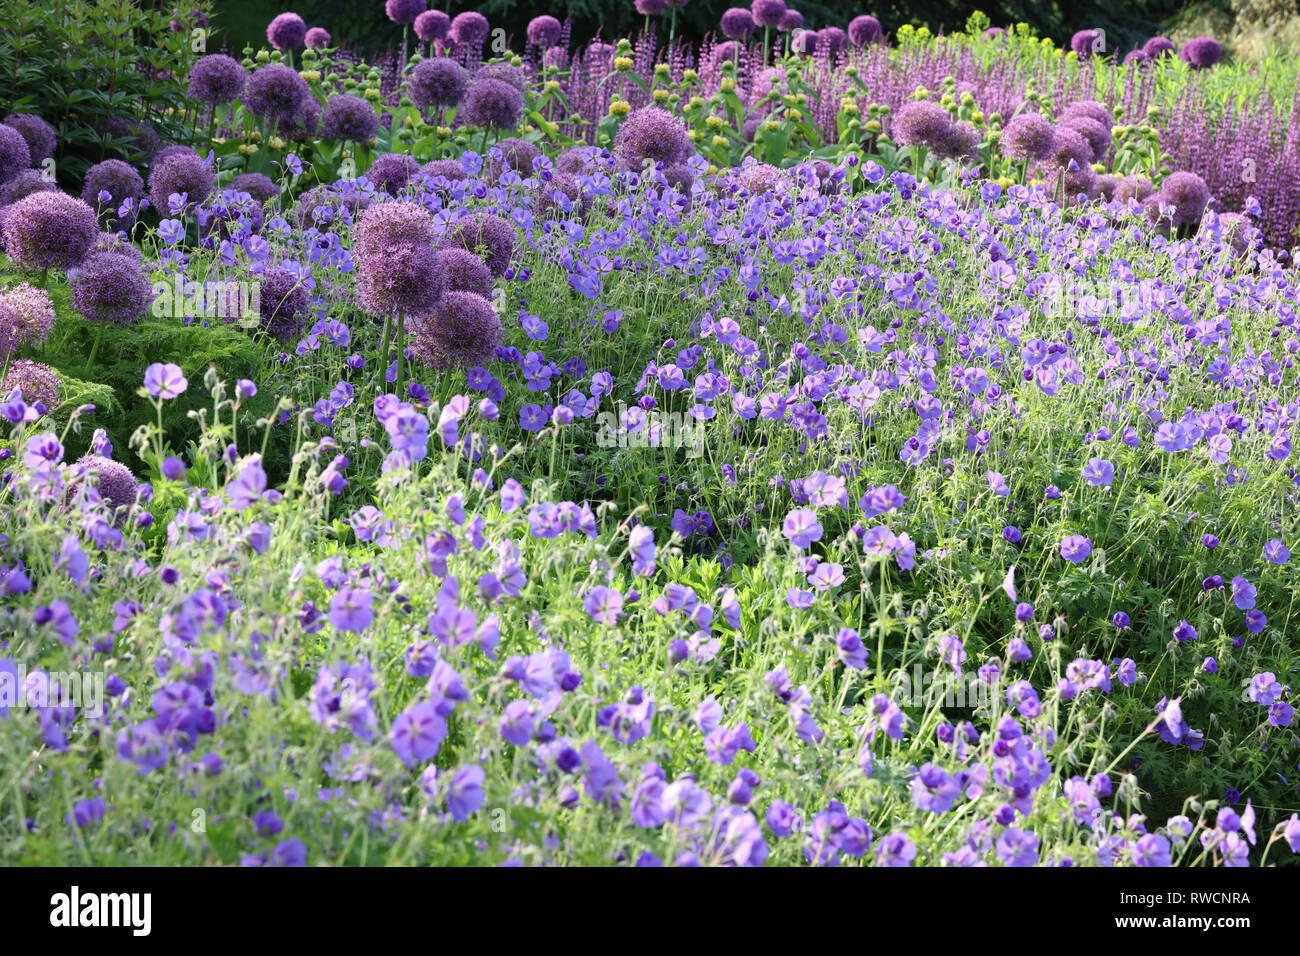 Large Group Of Allium Gladiator Planted With Geranium Rozanne